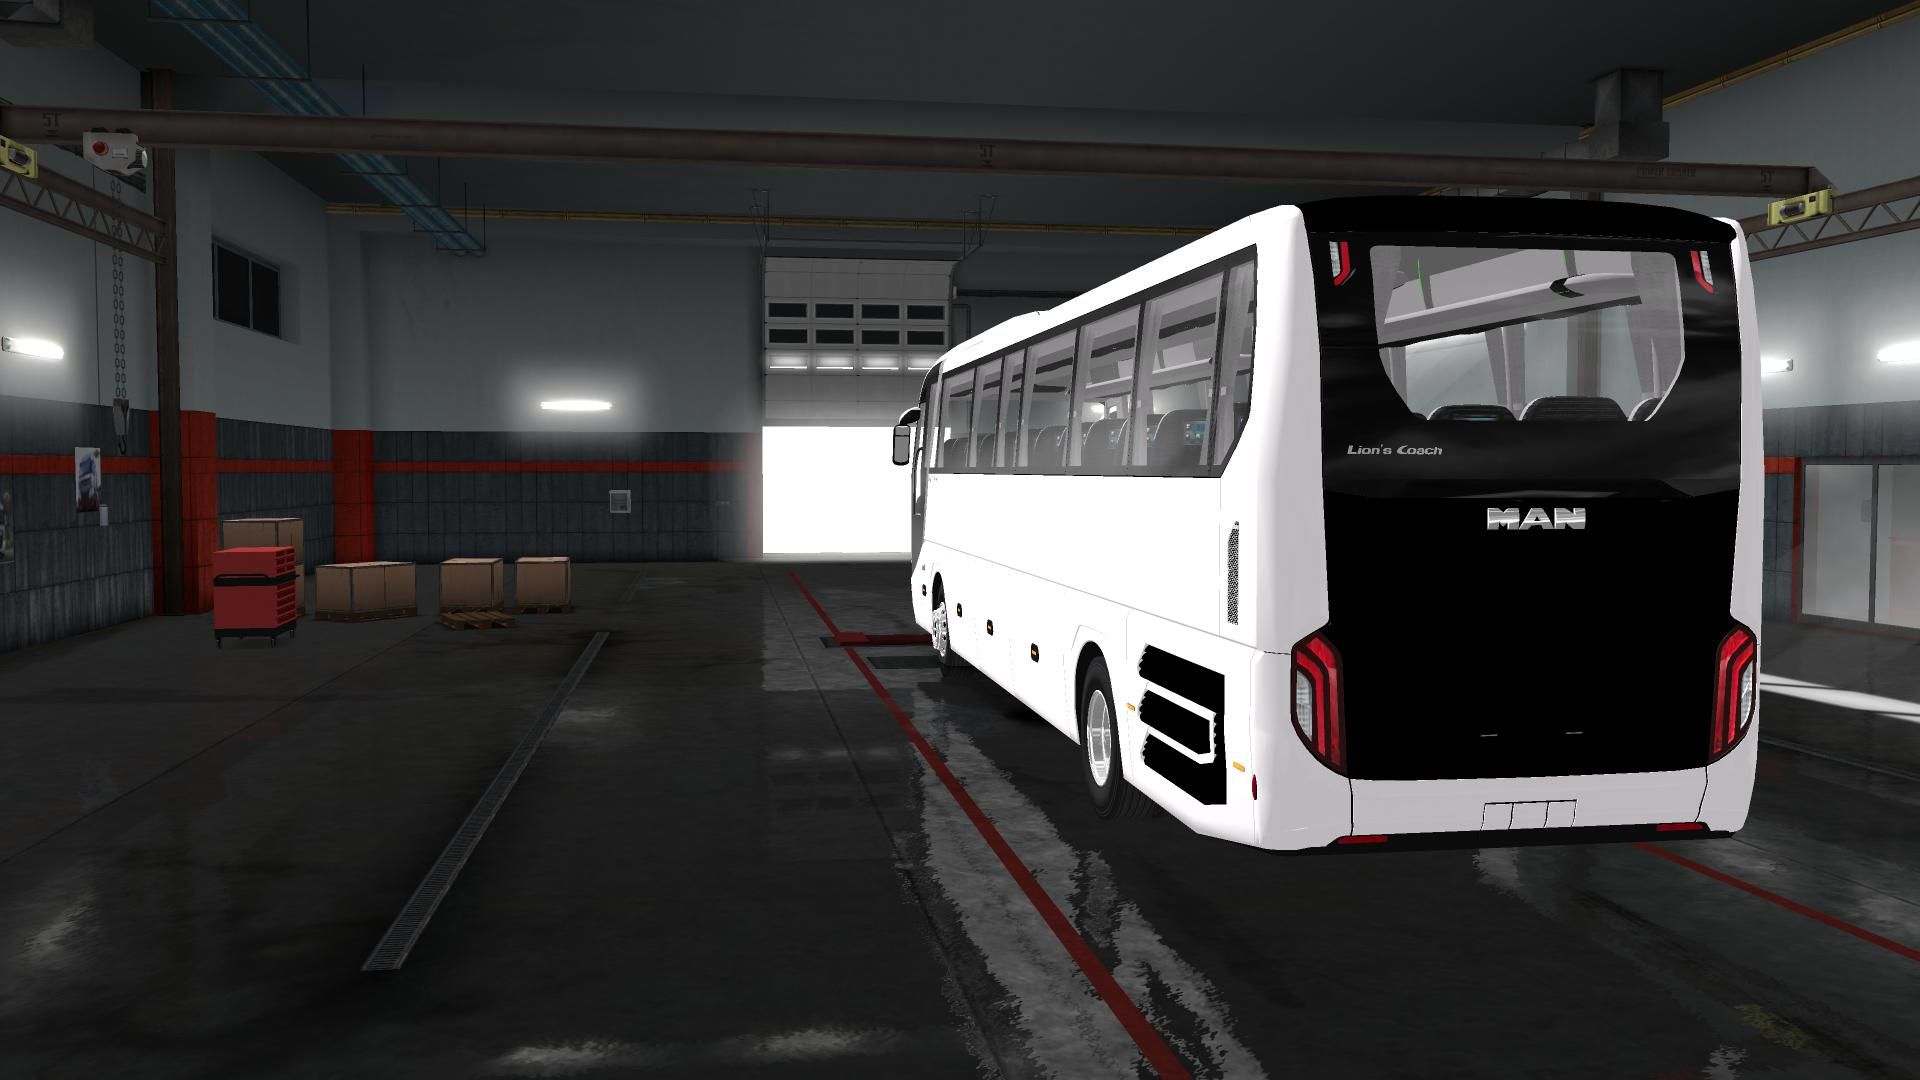 Man Lion S Coach 2018 Euro6 Speed Limit 100km H V1 0 Bus